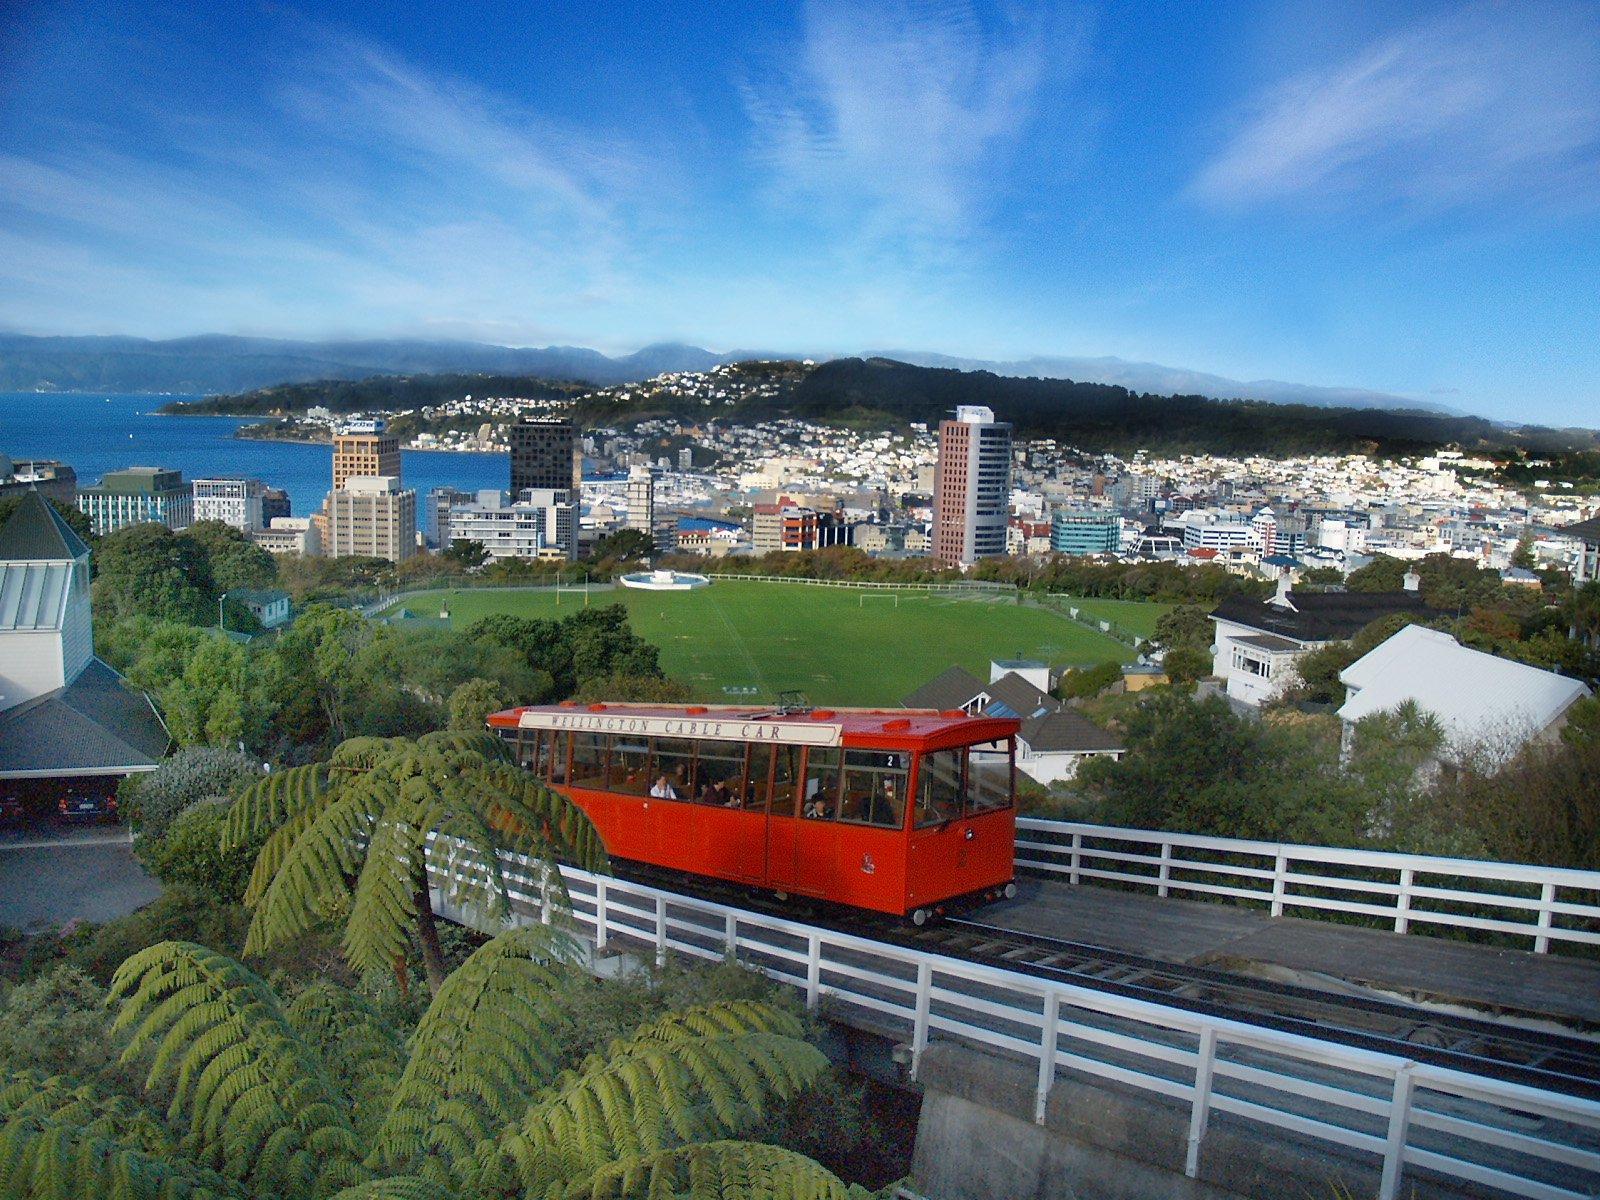 sea freight Wellington City - Cable Car